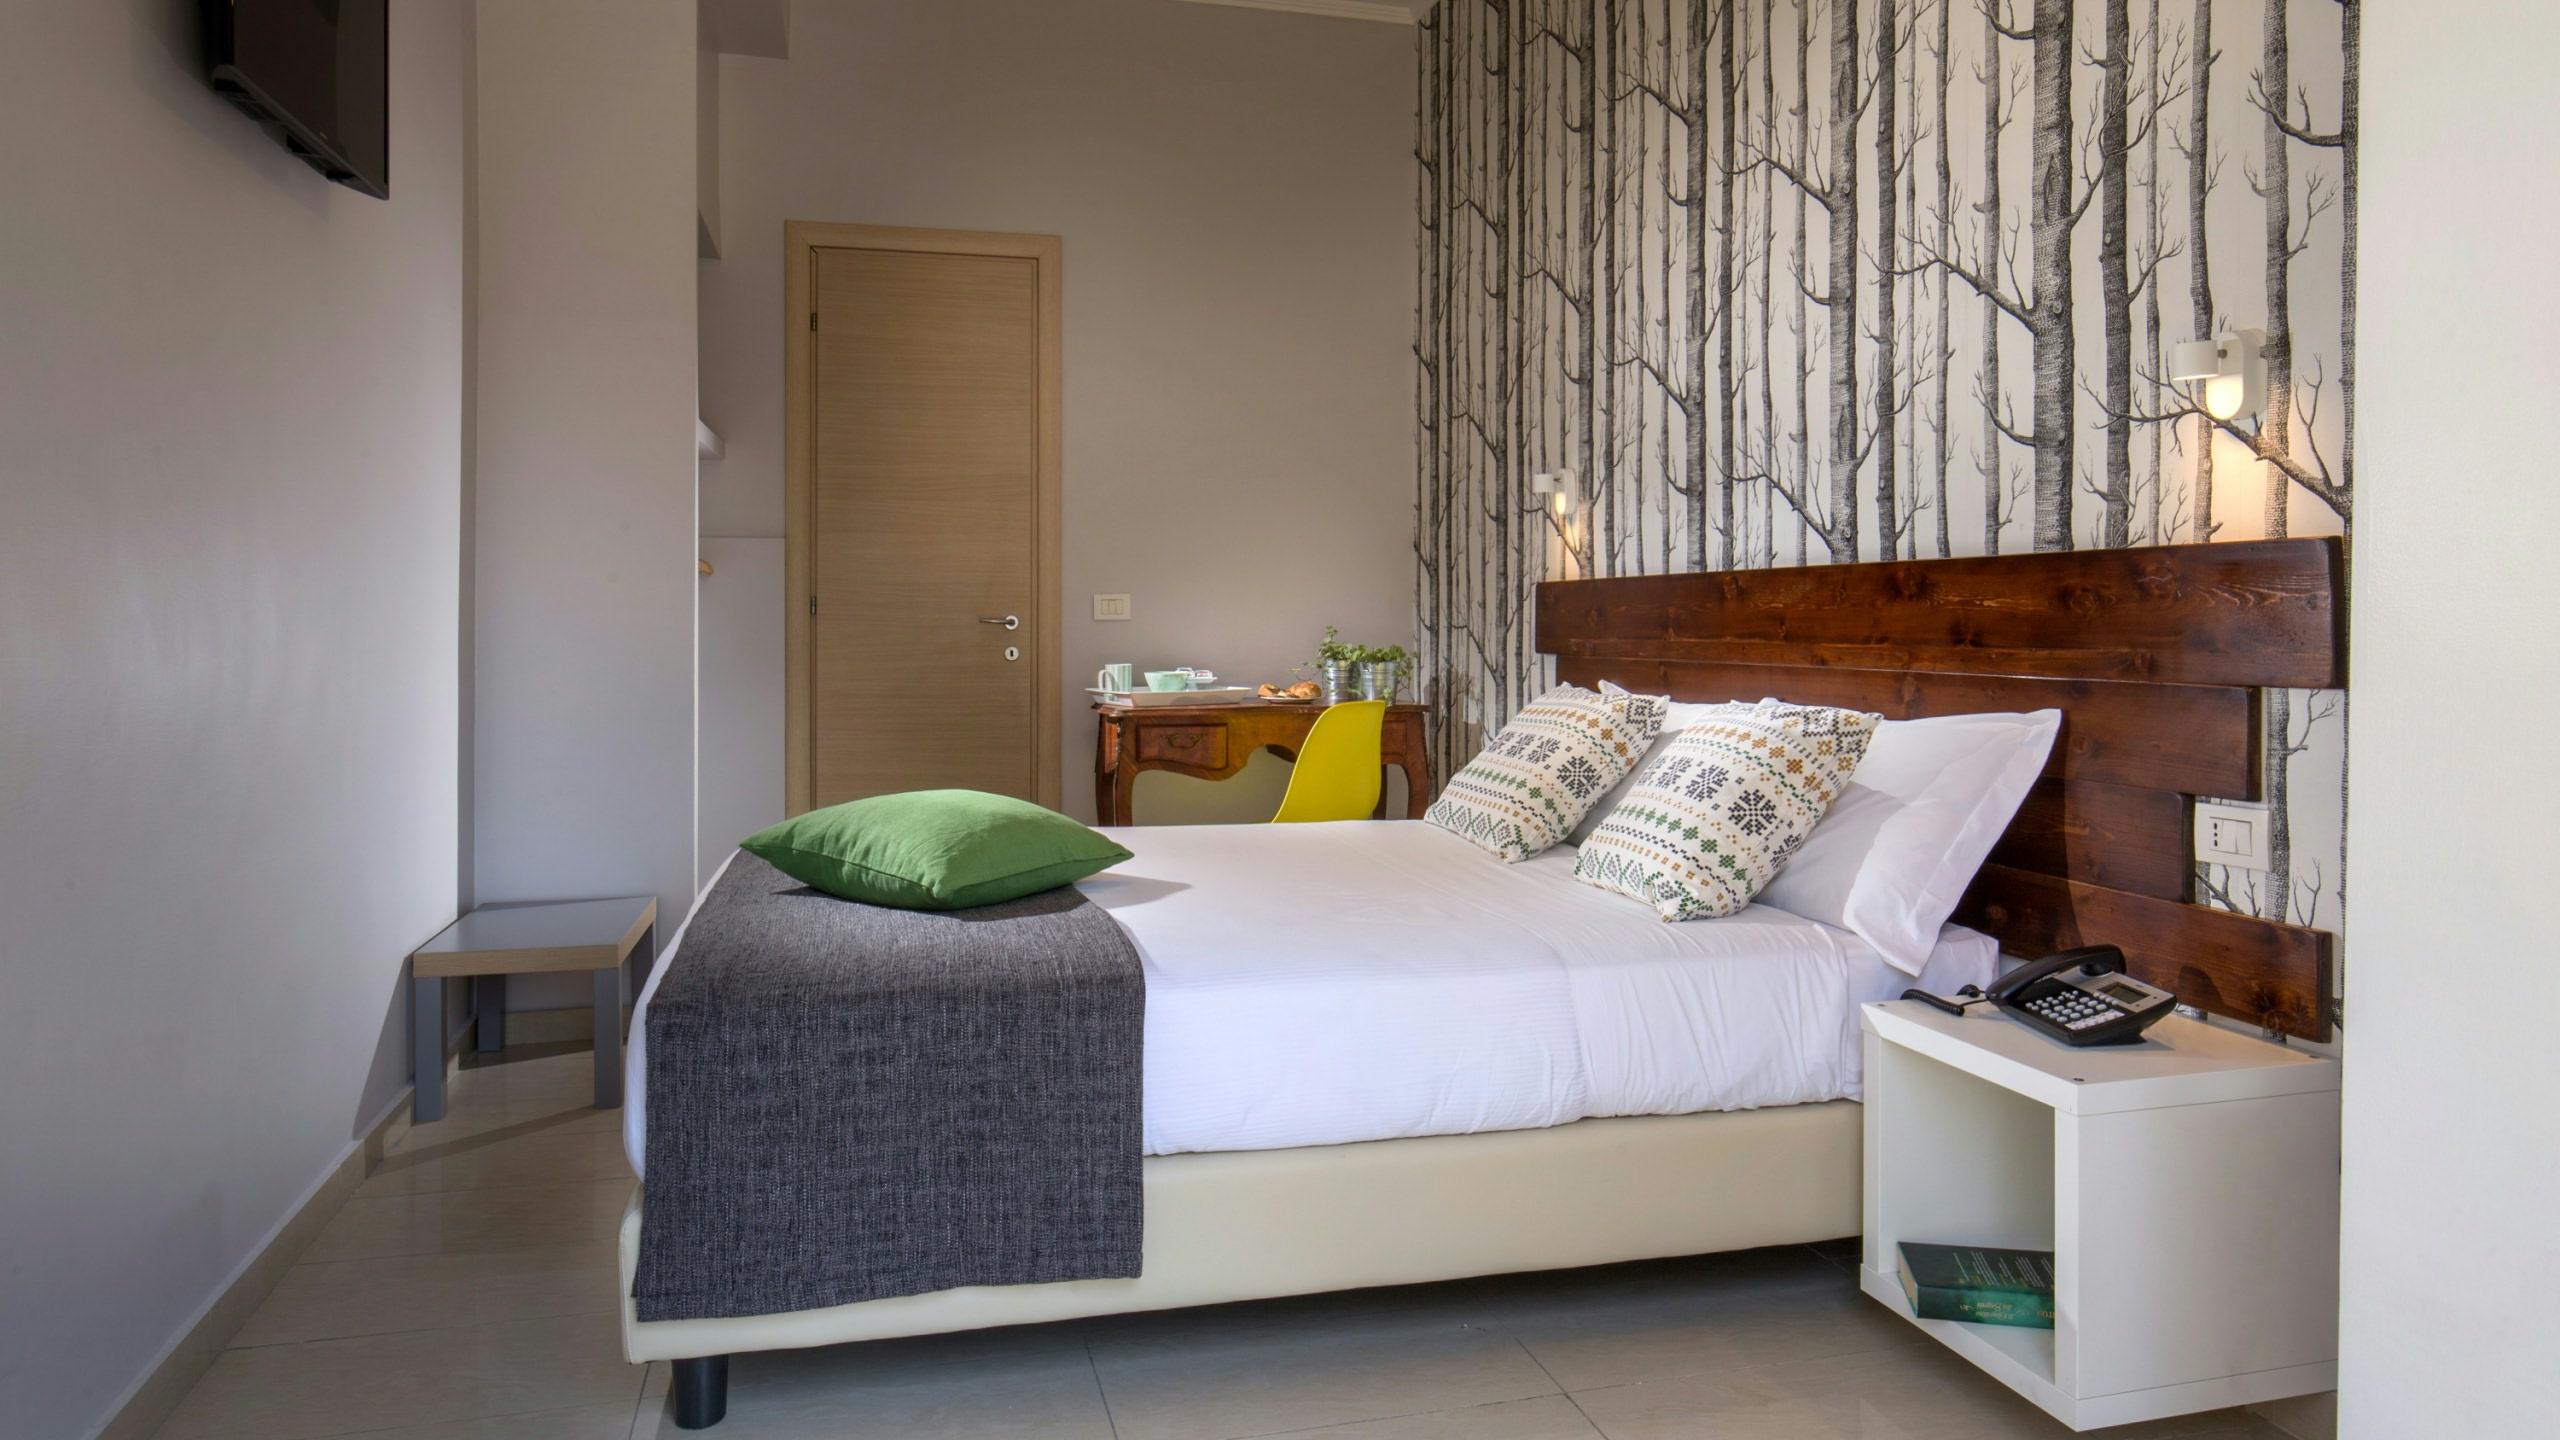 urbangarden-hotel-roma-camere-17